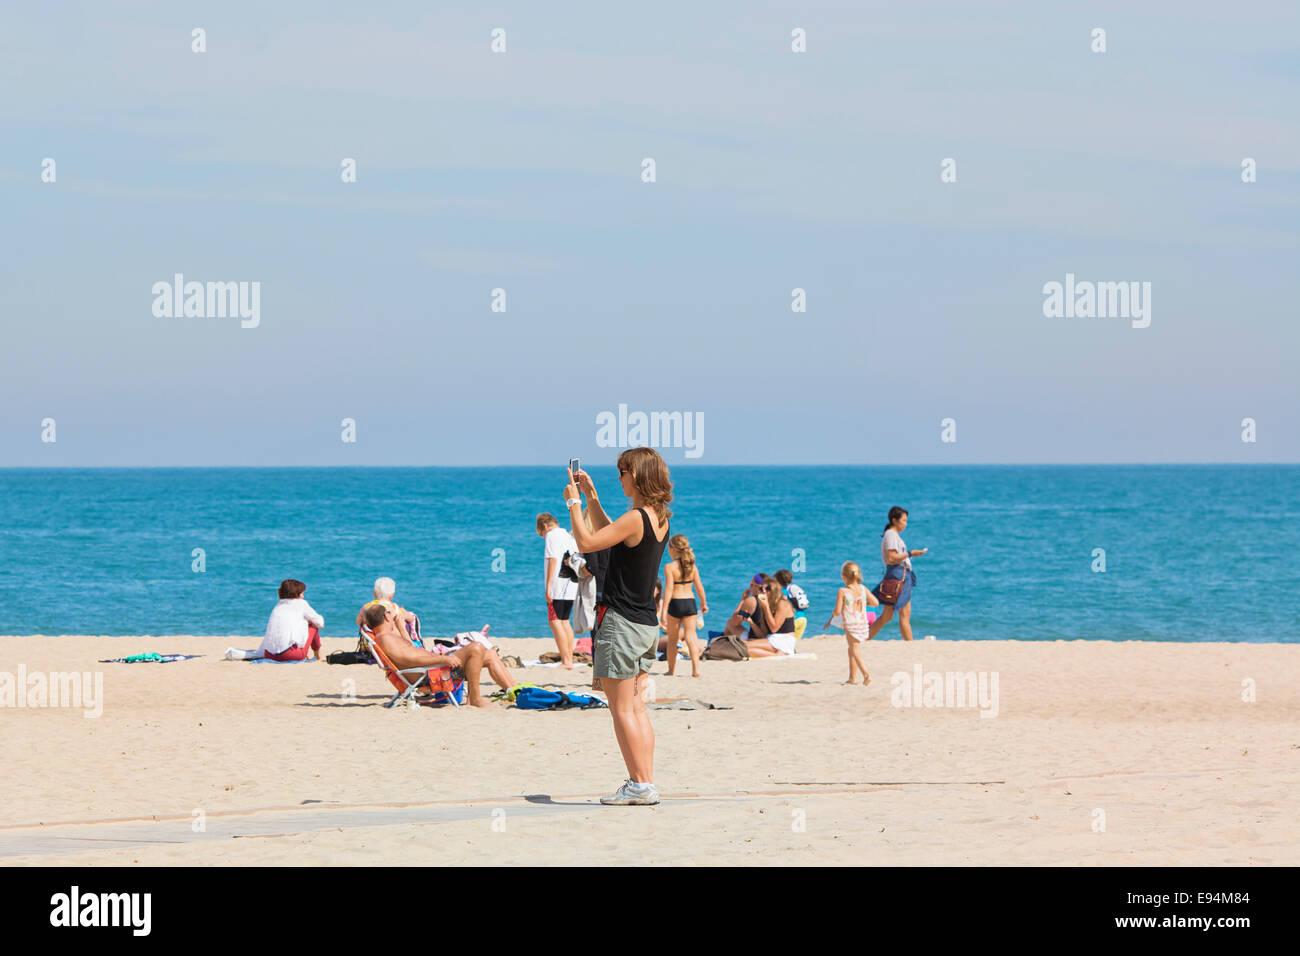 Frau am Strand mit Handy, fotografieren Stockfoto